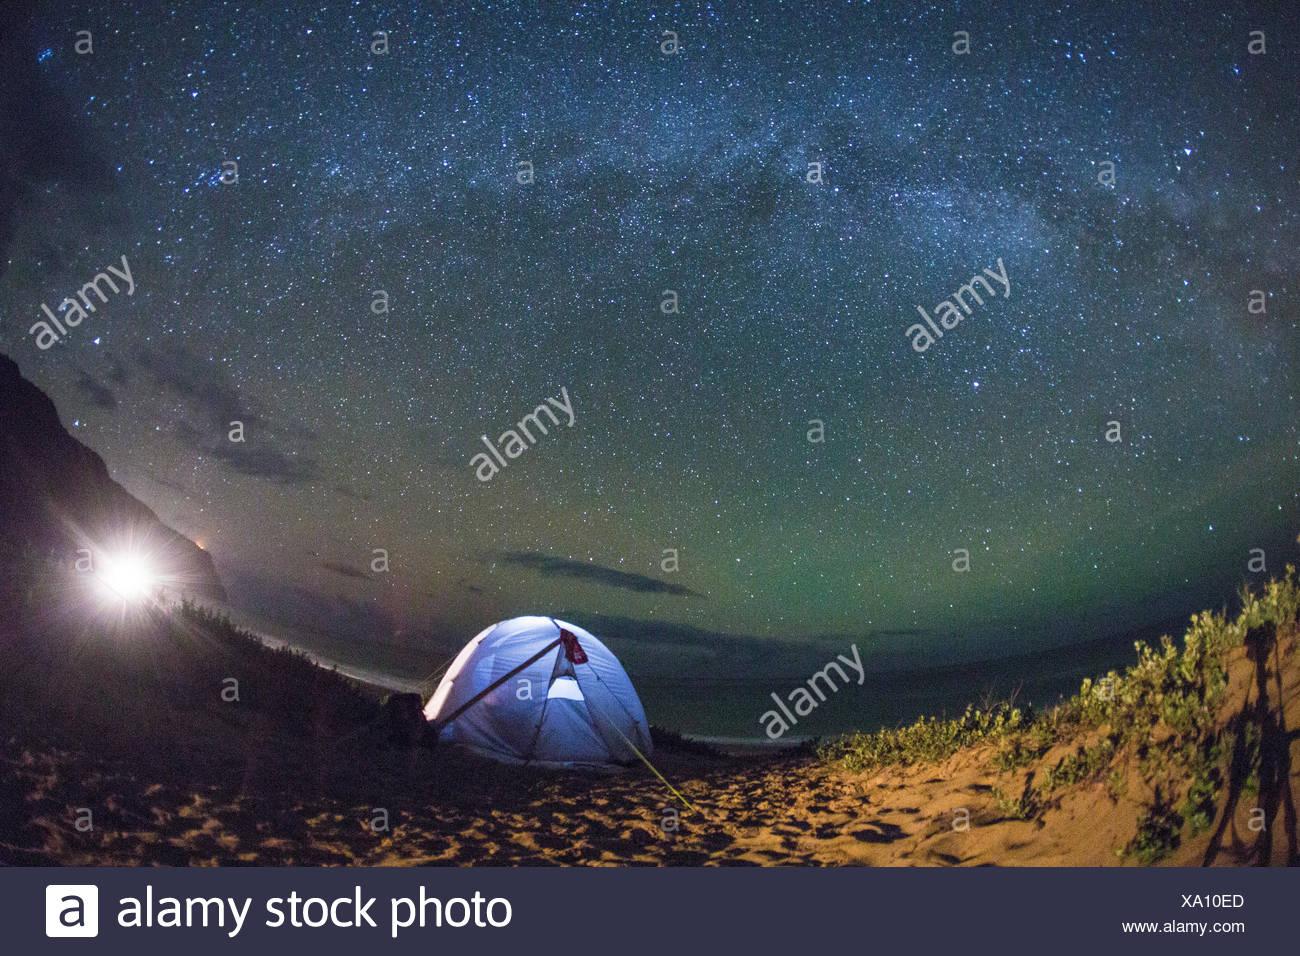 Kauai, camping, Kauai, Sternenhimmel, Sterne, Abend, Astro, USA, Hawaii, Amerika, Stockbild